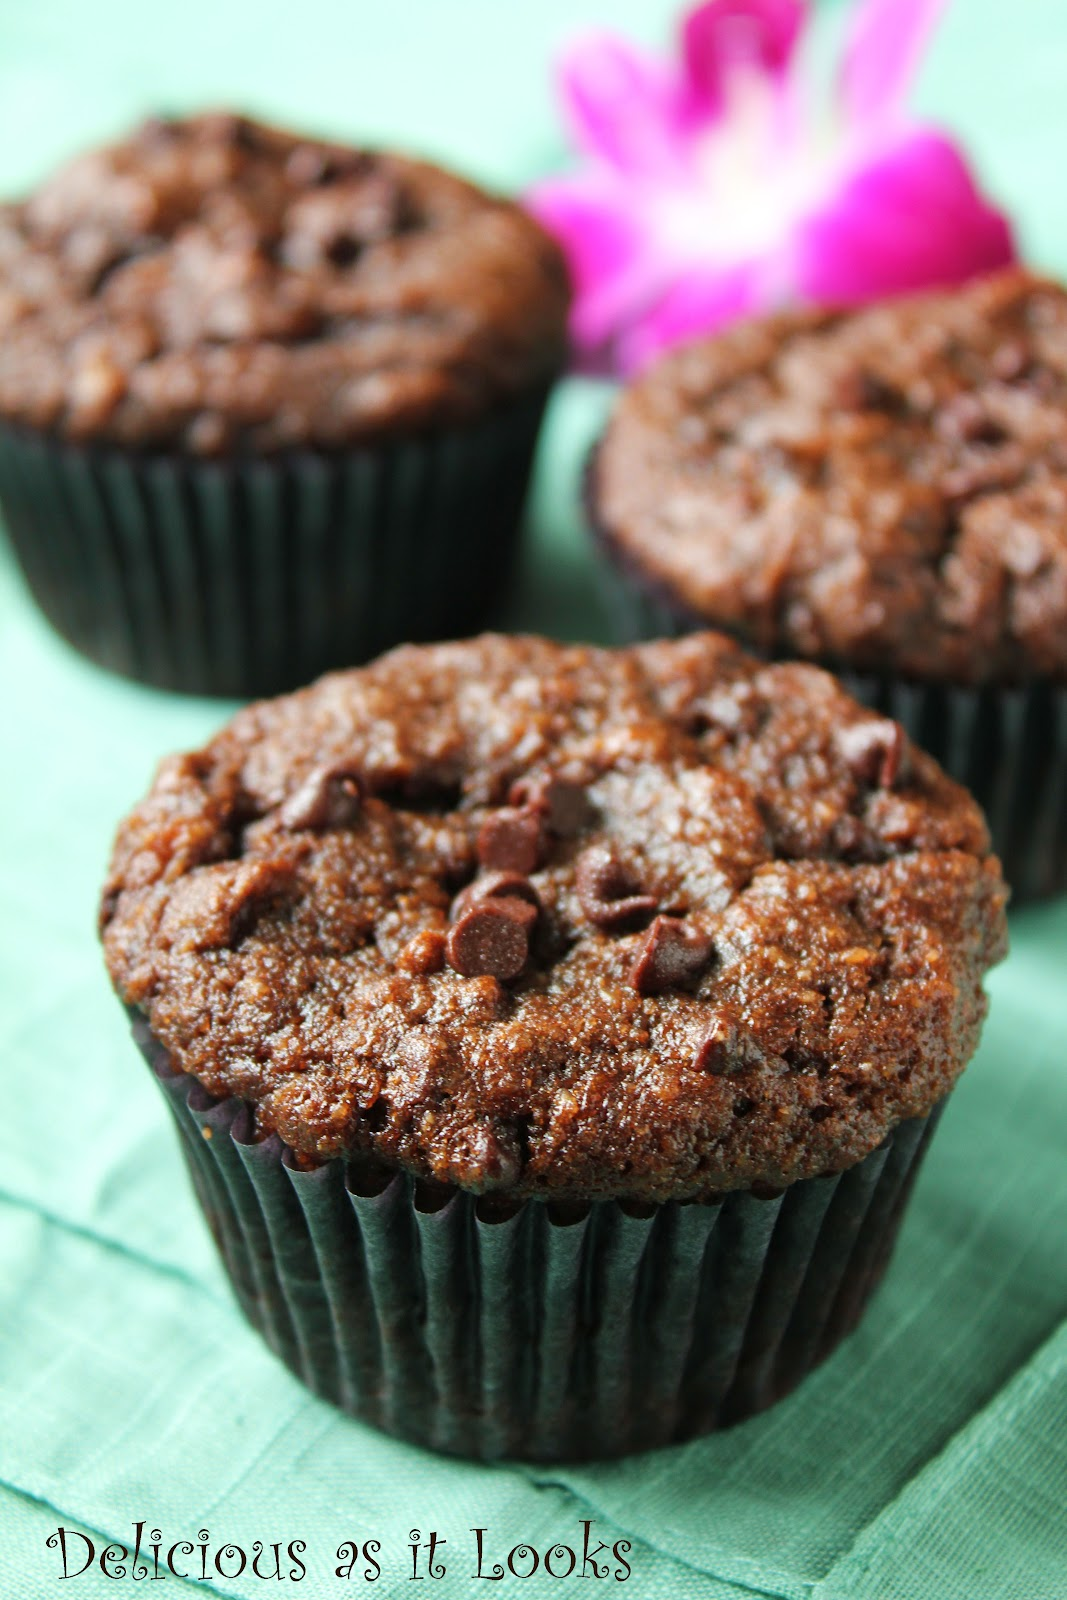 ... : Double Chocolate Almond Banana Muffins (Gluten-Free, Grain-Free